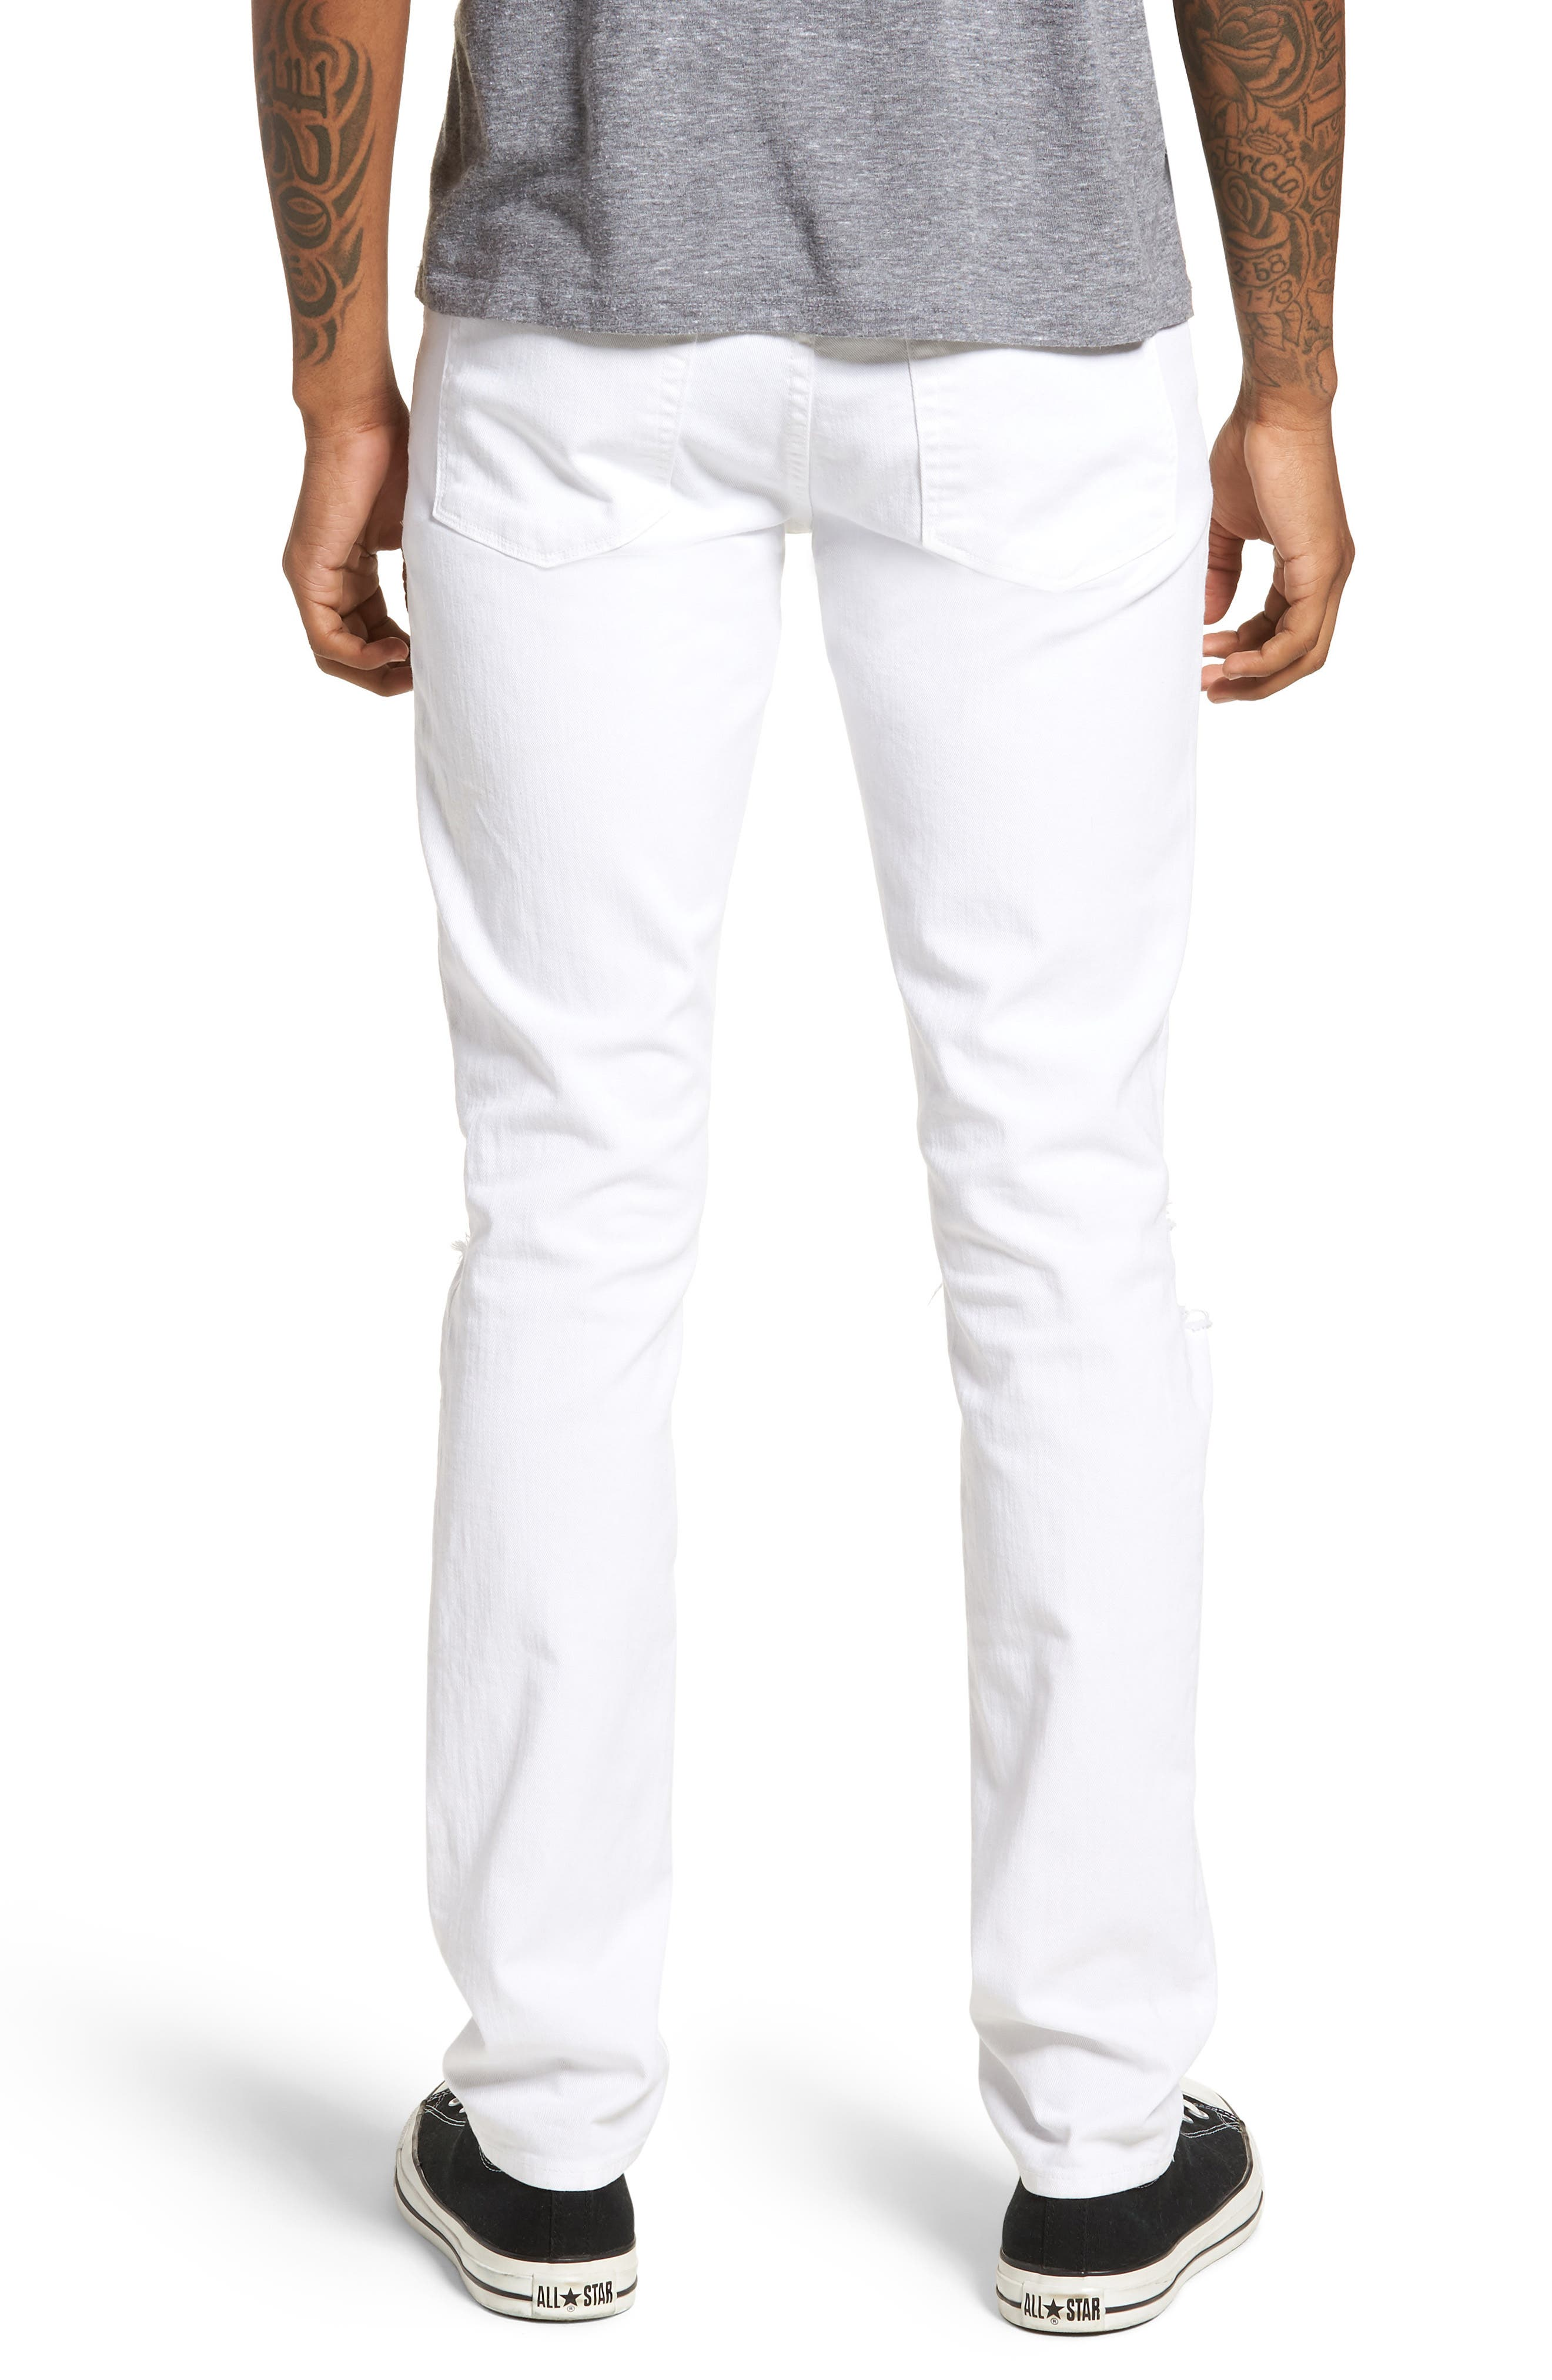 Mick Distressed Skinny Fit Jeans,                             Alternate thumbnail 2, color,                             WHITMAN OAK